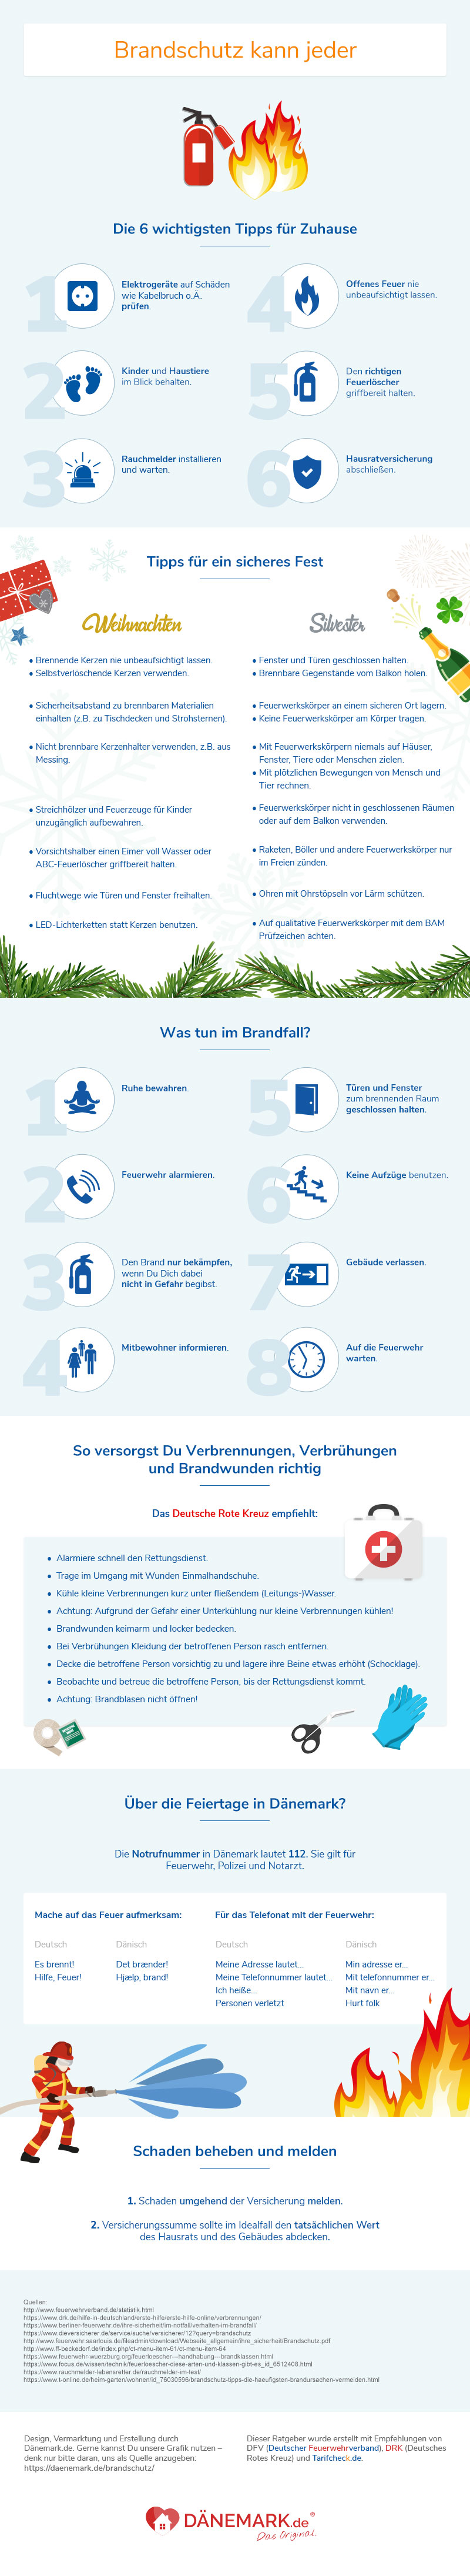 Infografik Brandschutz in Dänemark